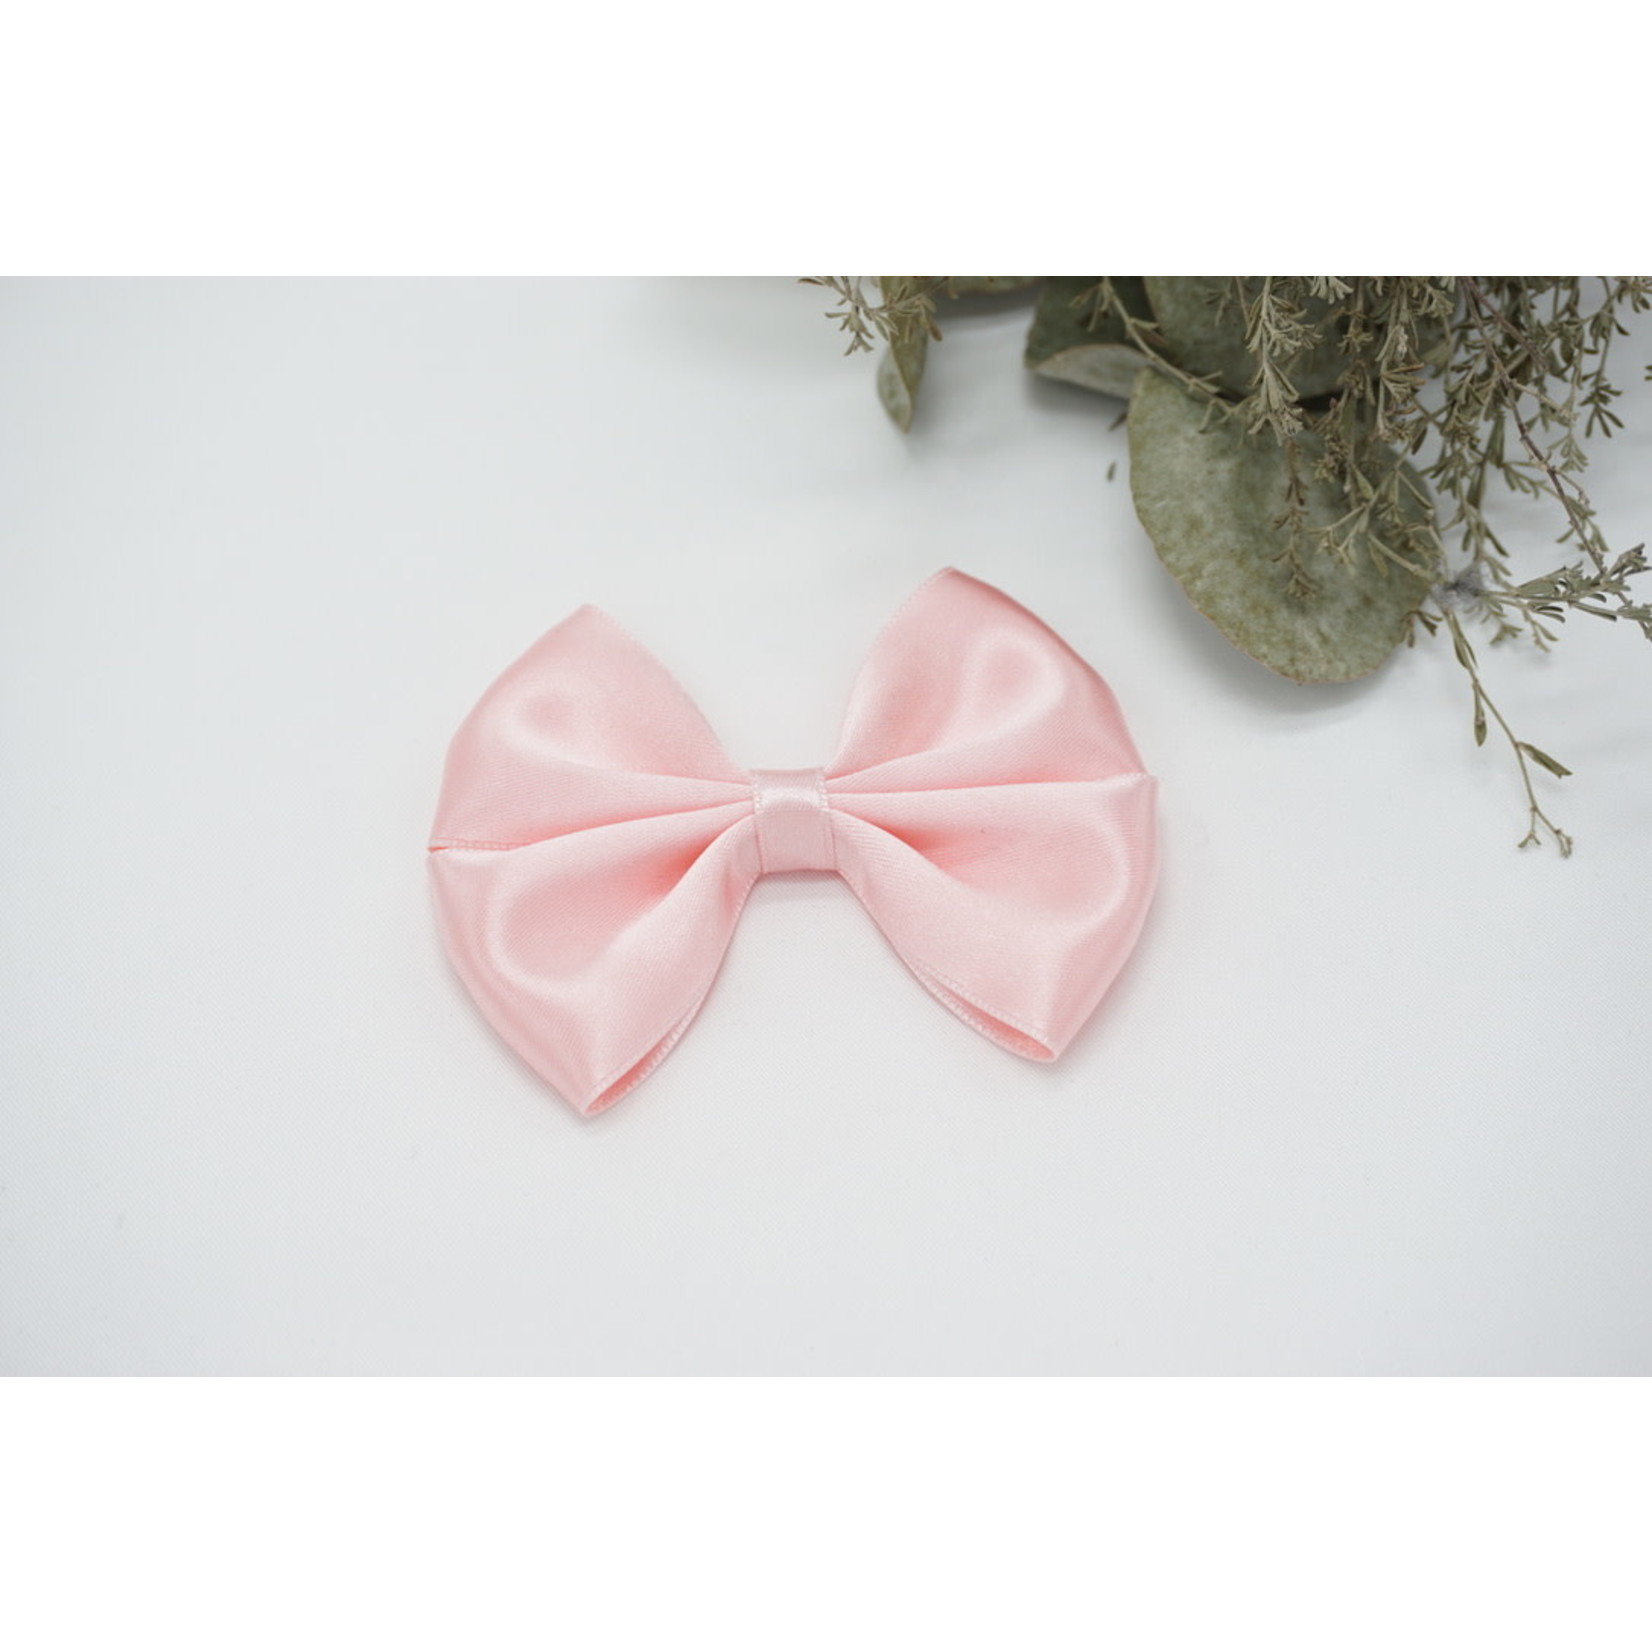 Petite Zara Satin Bow - Pink 1